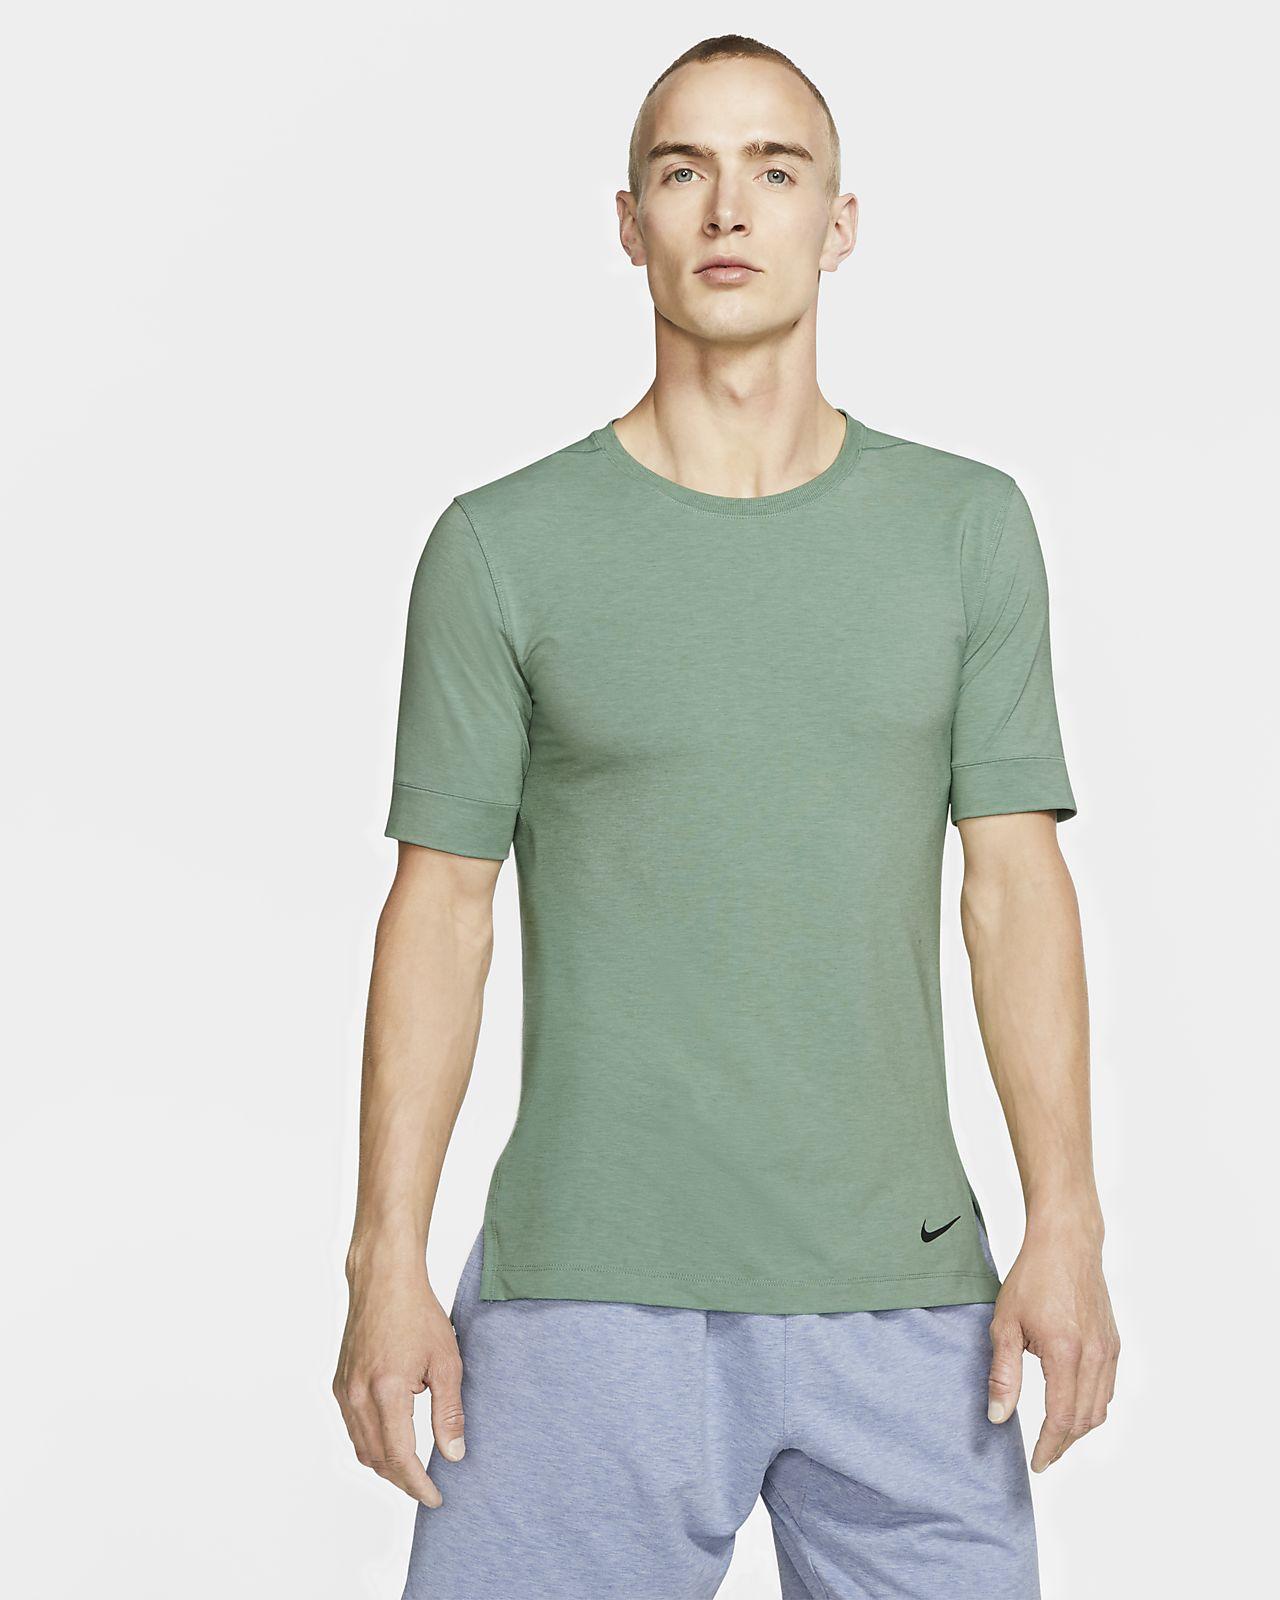 c53244c4c0 Nike Dri-FIT Men's Short-Sleeve Yoga Training Top